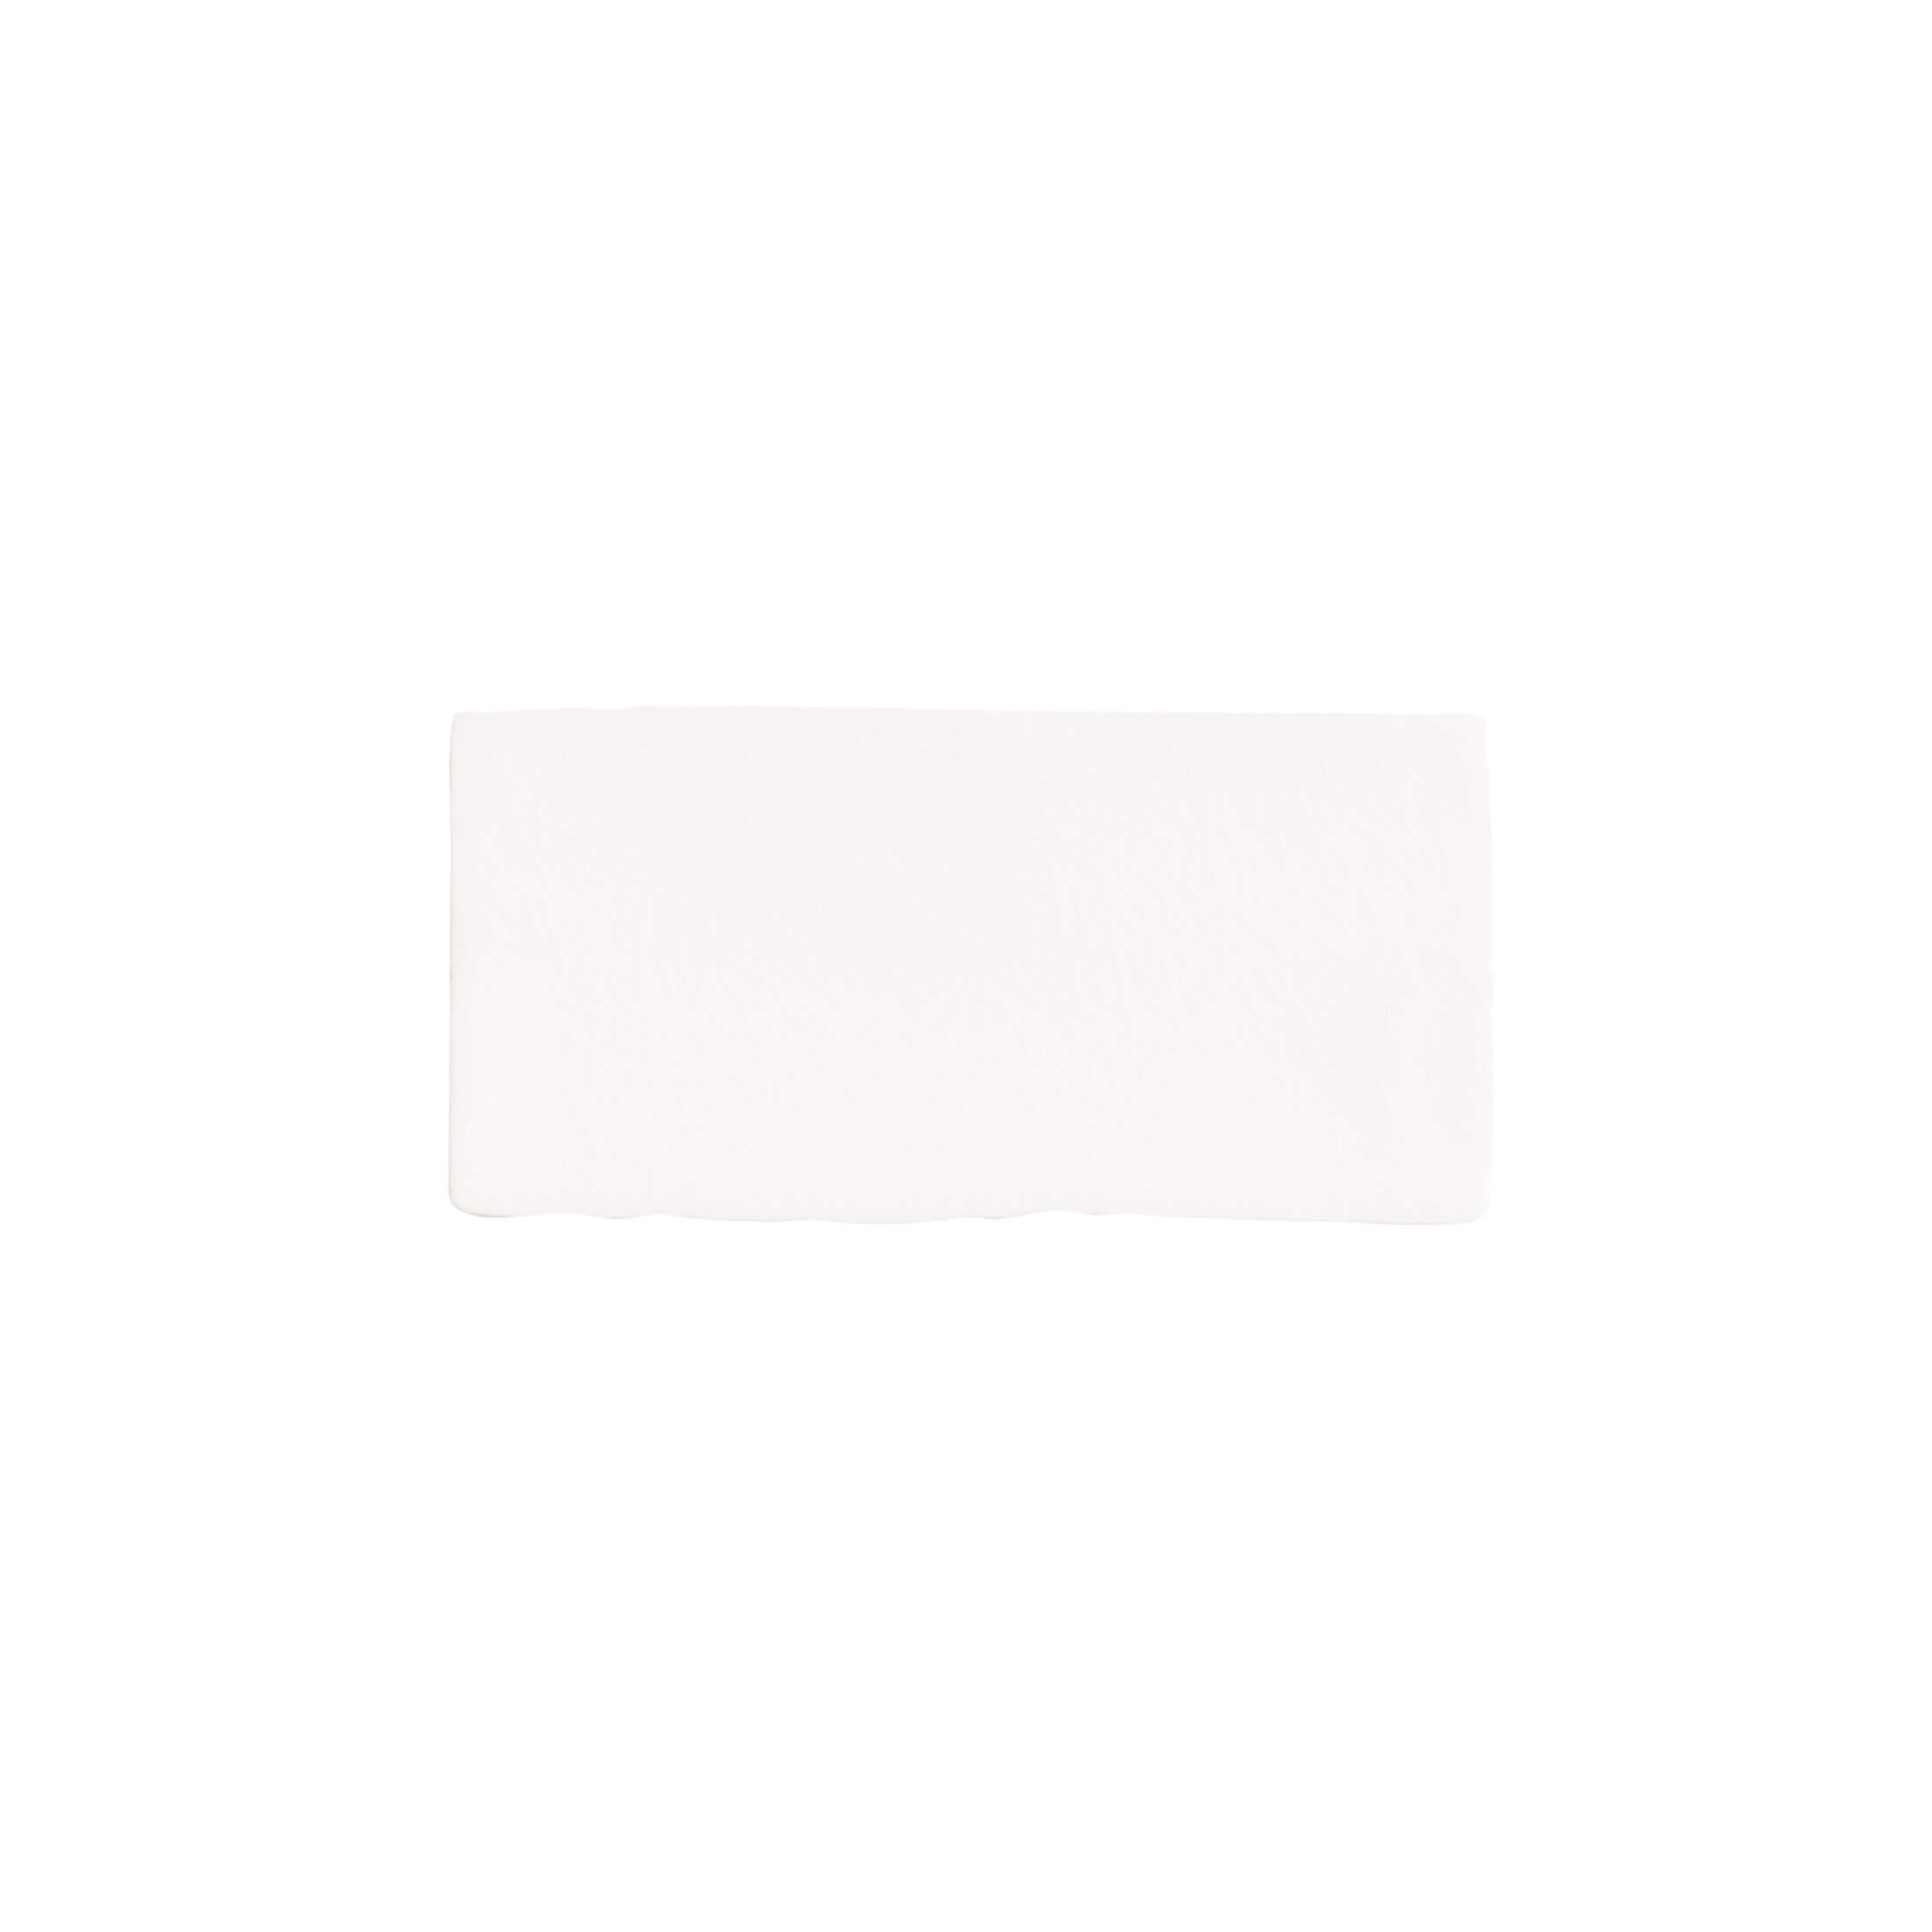 ADNT1010 - LISO  - 7.5 cm X 15 cm